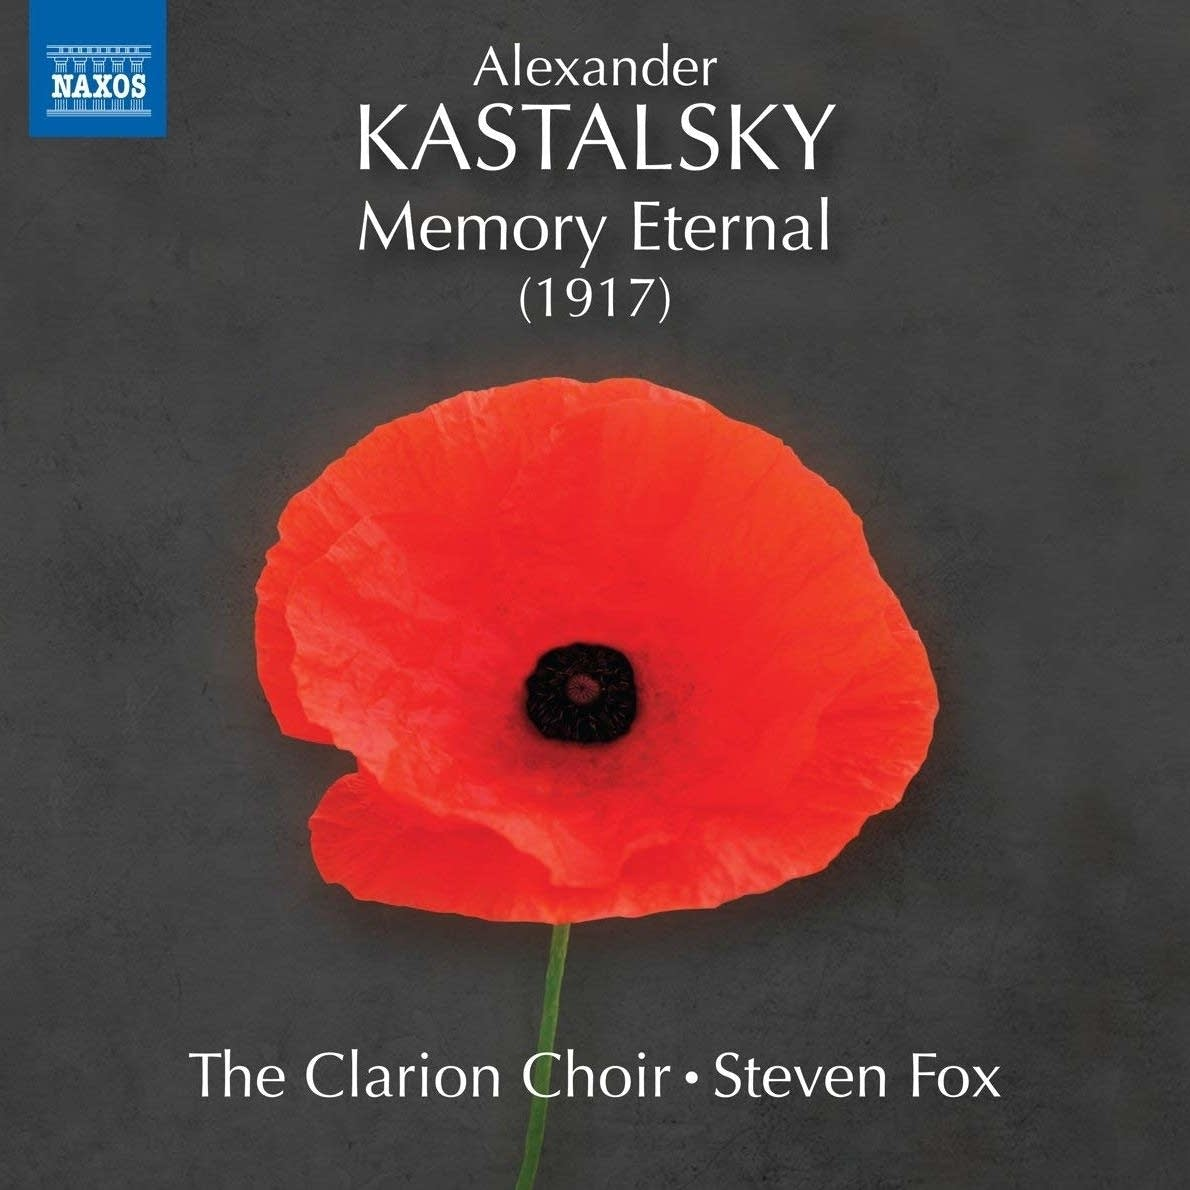 Brian Giebler, Tenor – Kastalsky: Memory Eternal – Naxos Classics, 2018